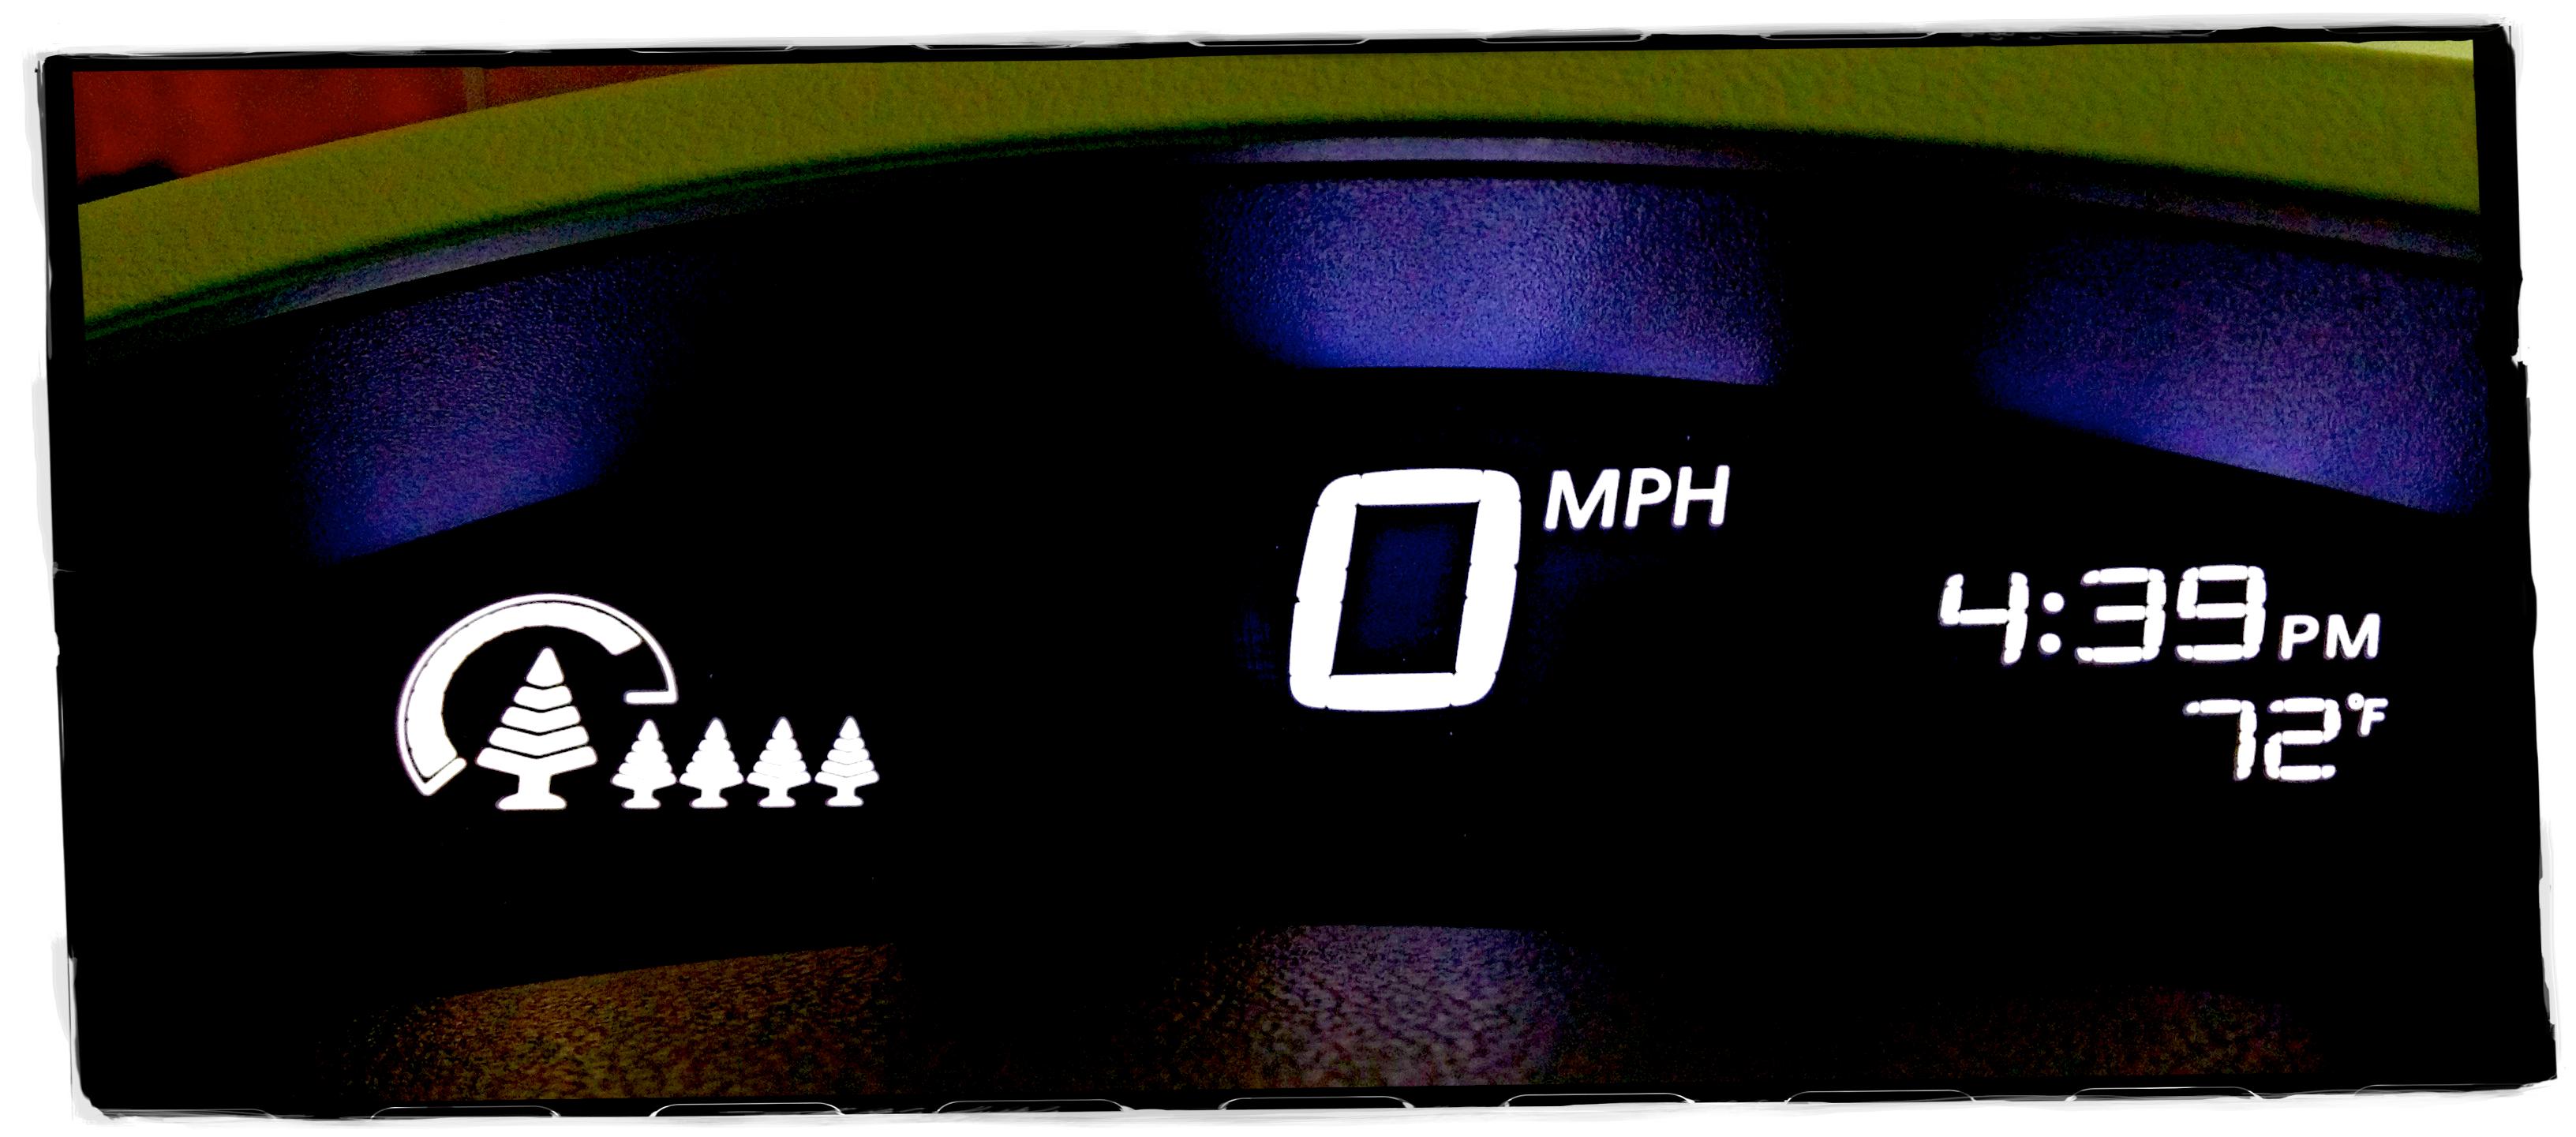 Nissan Leaf's Eco-indicator